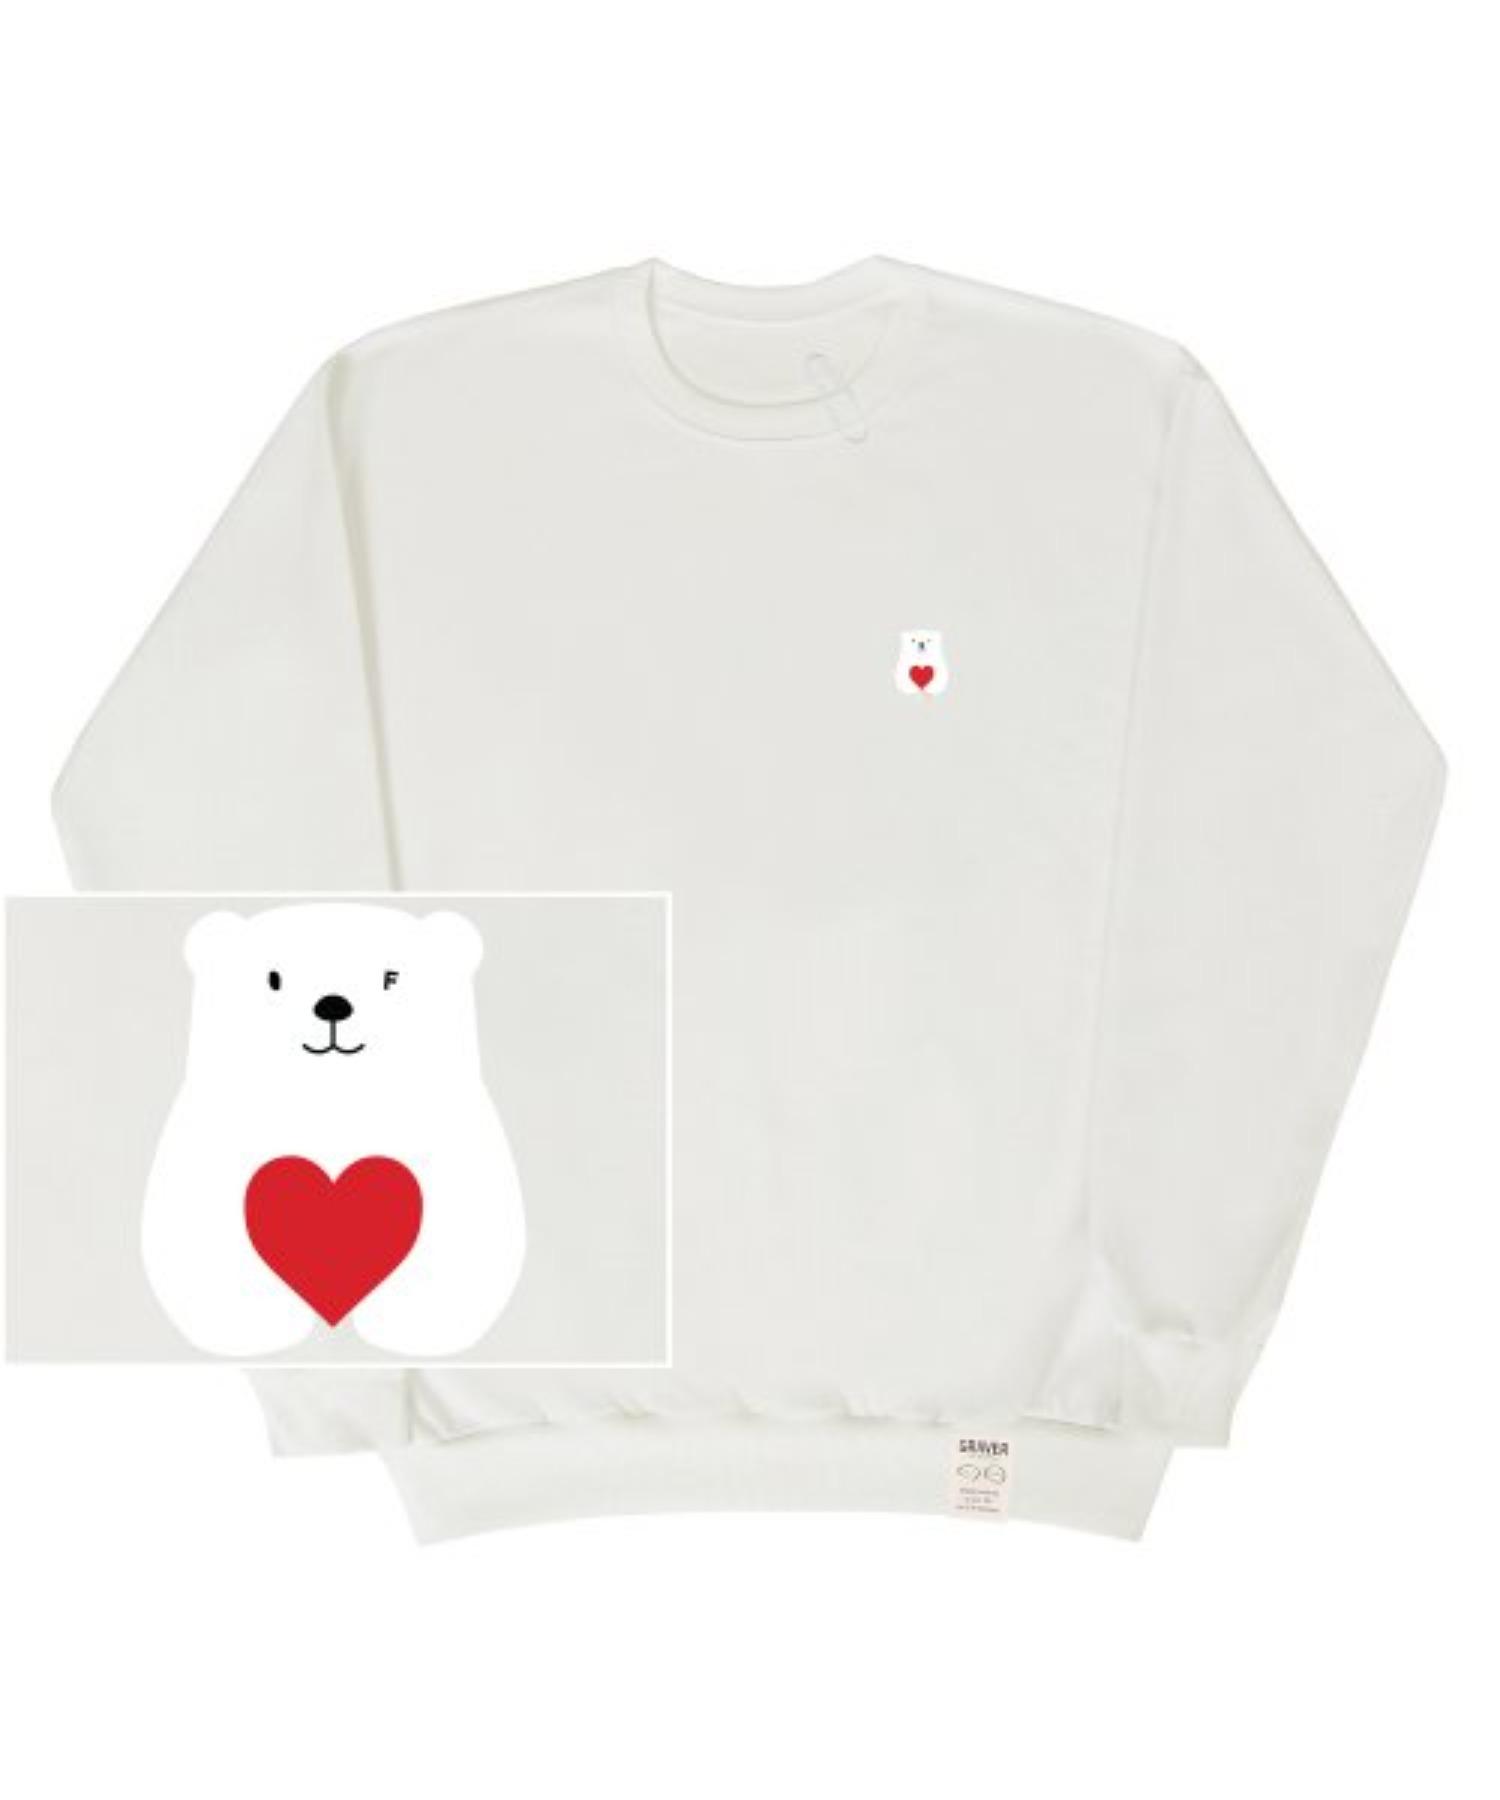 [UNISEX] Small Polar Bear Red Heart White Clip Sweatshirt_Ivory